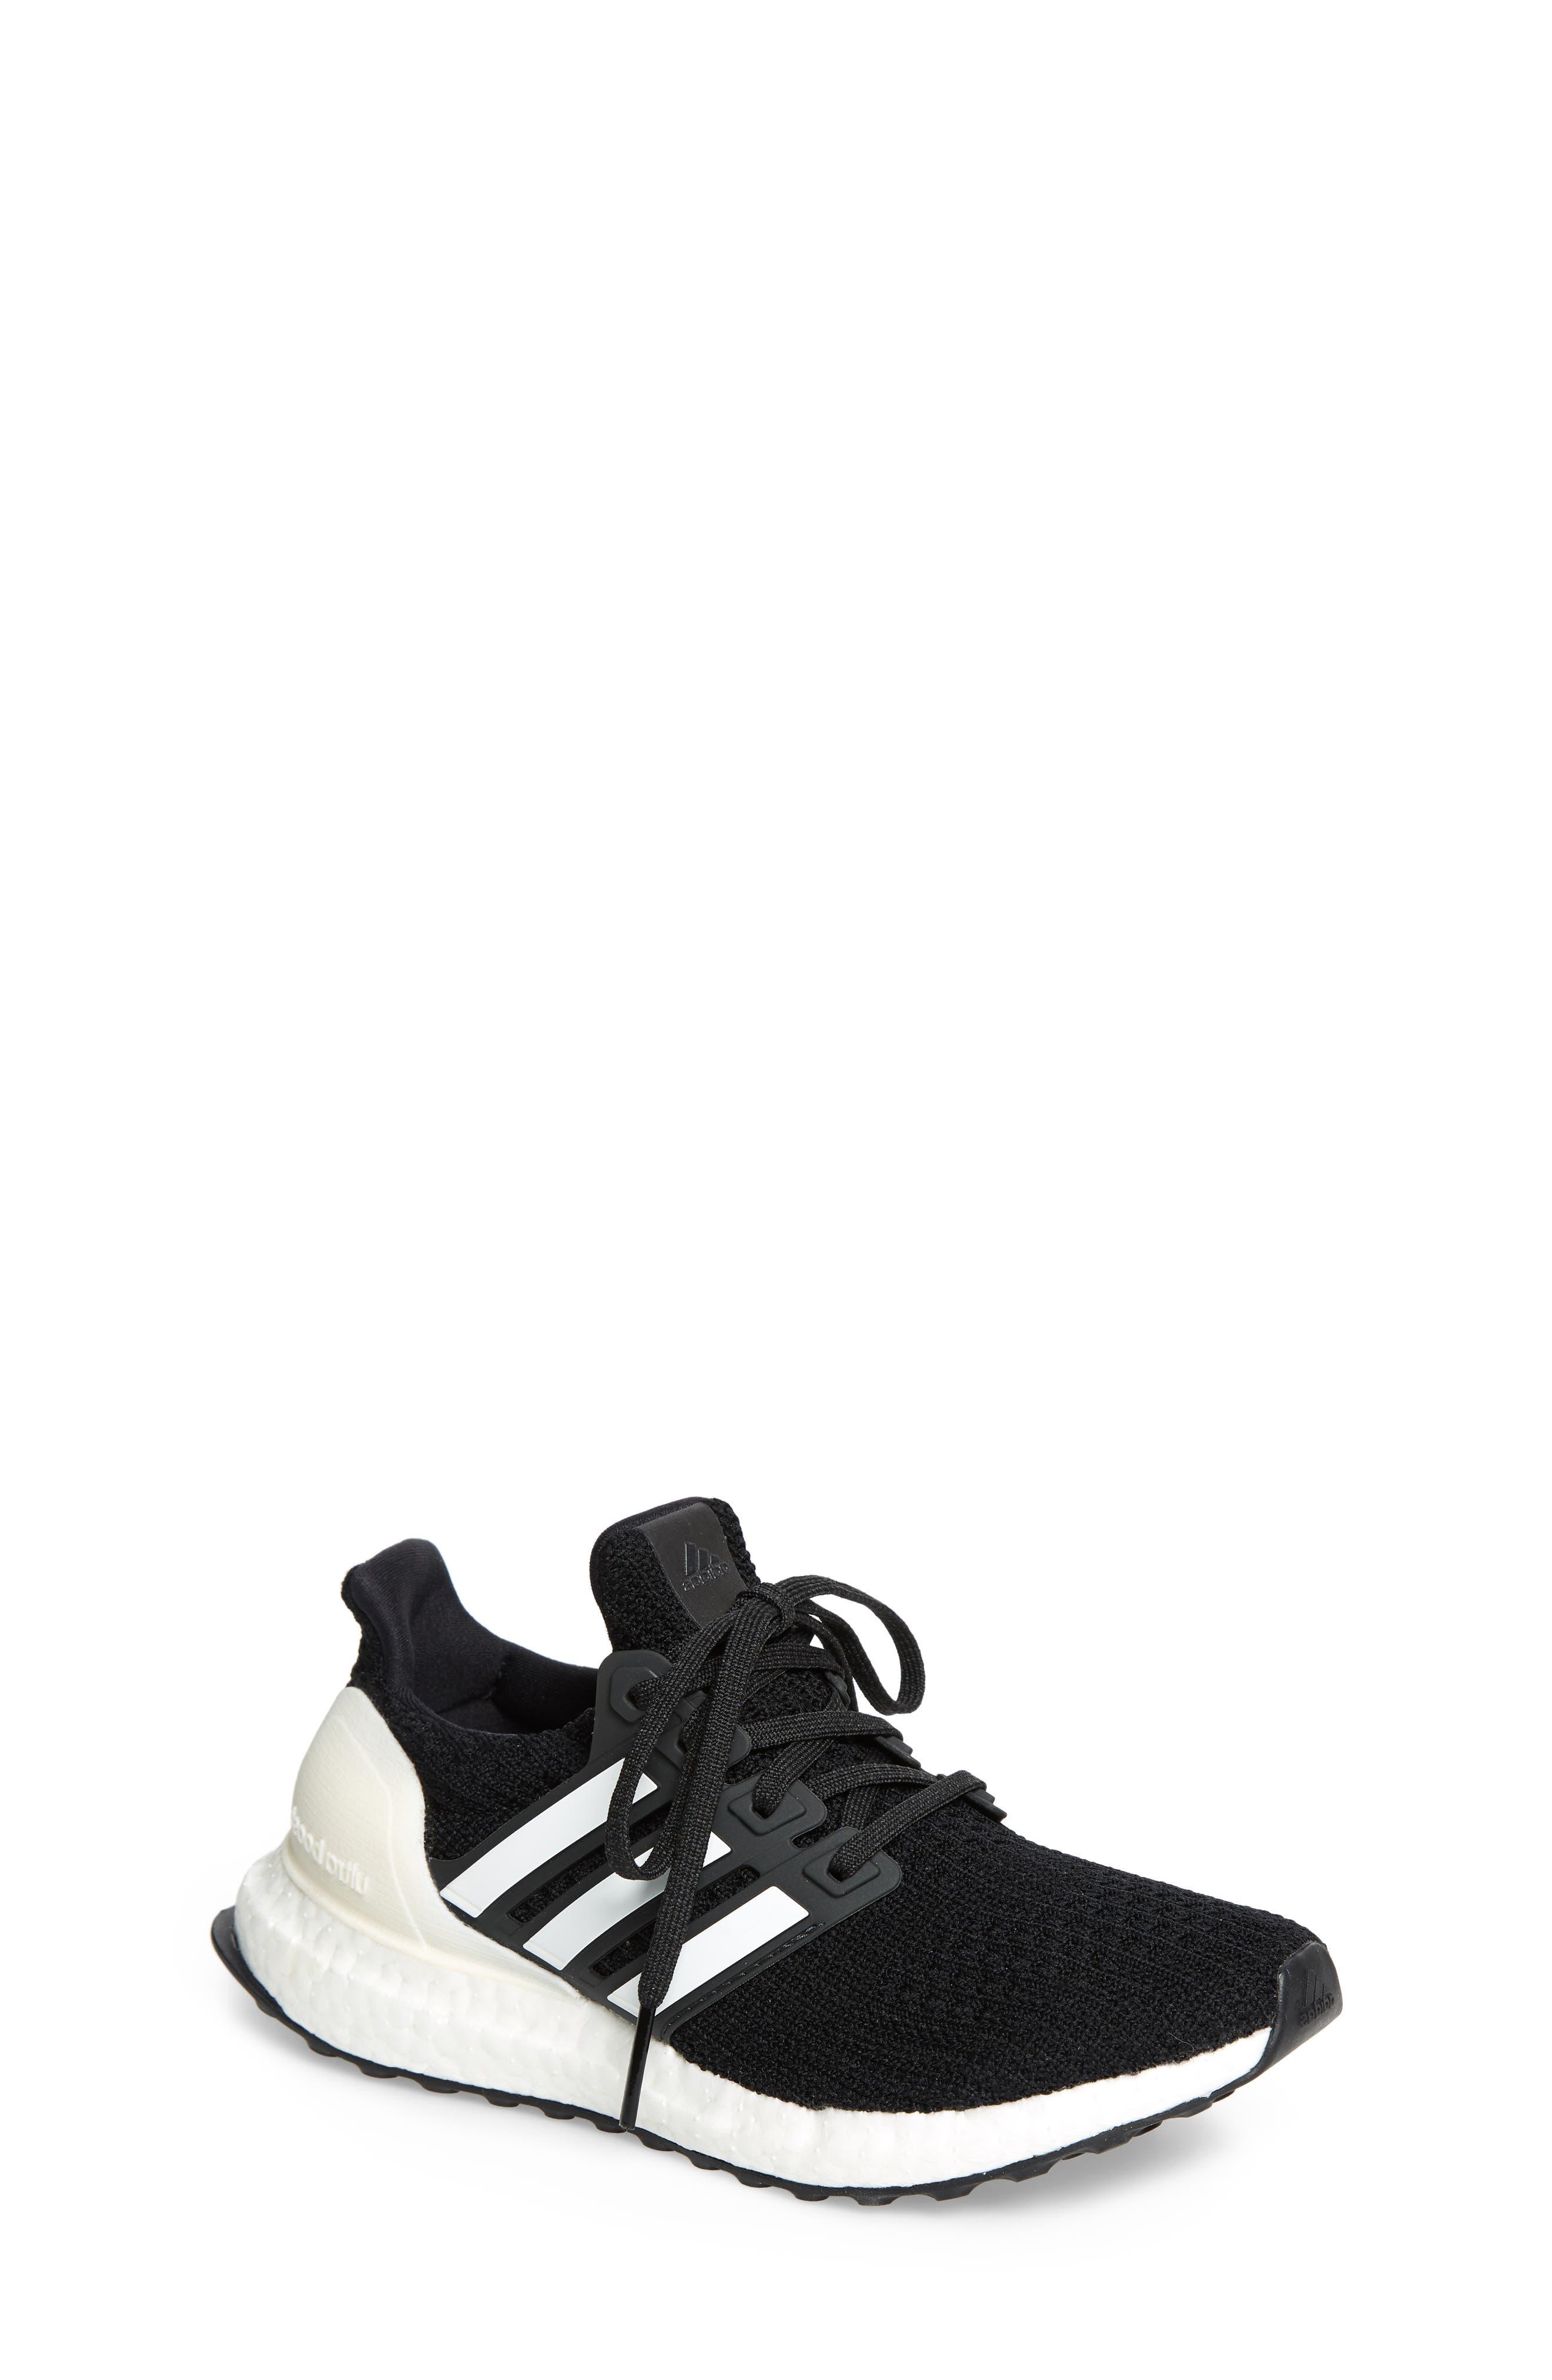 UltraBoost Sneaker,                             Main thumbnail 1, color,                             BLACK/ CLOUD WHITE/ CARBON